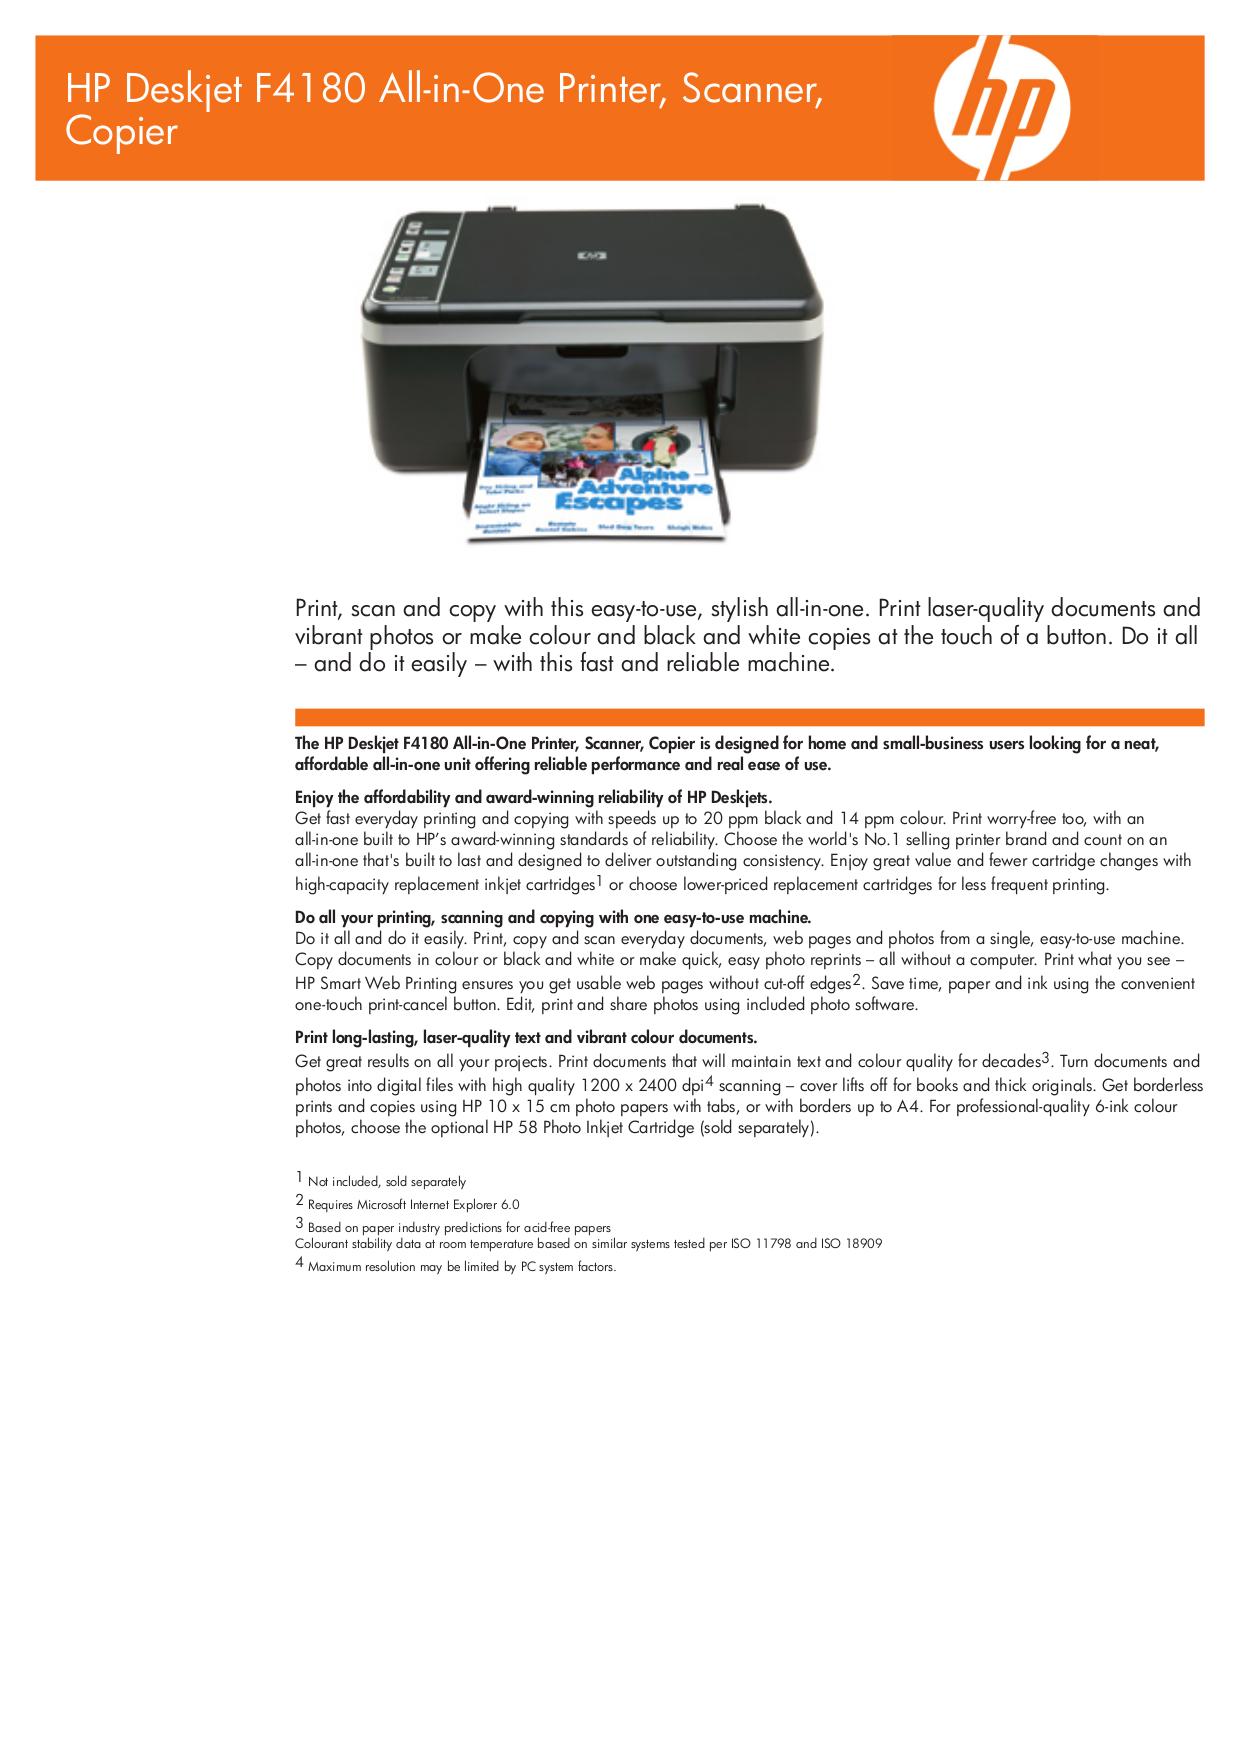 download free pdf for hp deskjet f4180 multifunction printer manual rh umlib com hp f4180 manuel hp deskjet f4180 service manual